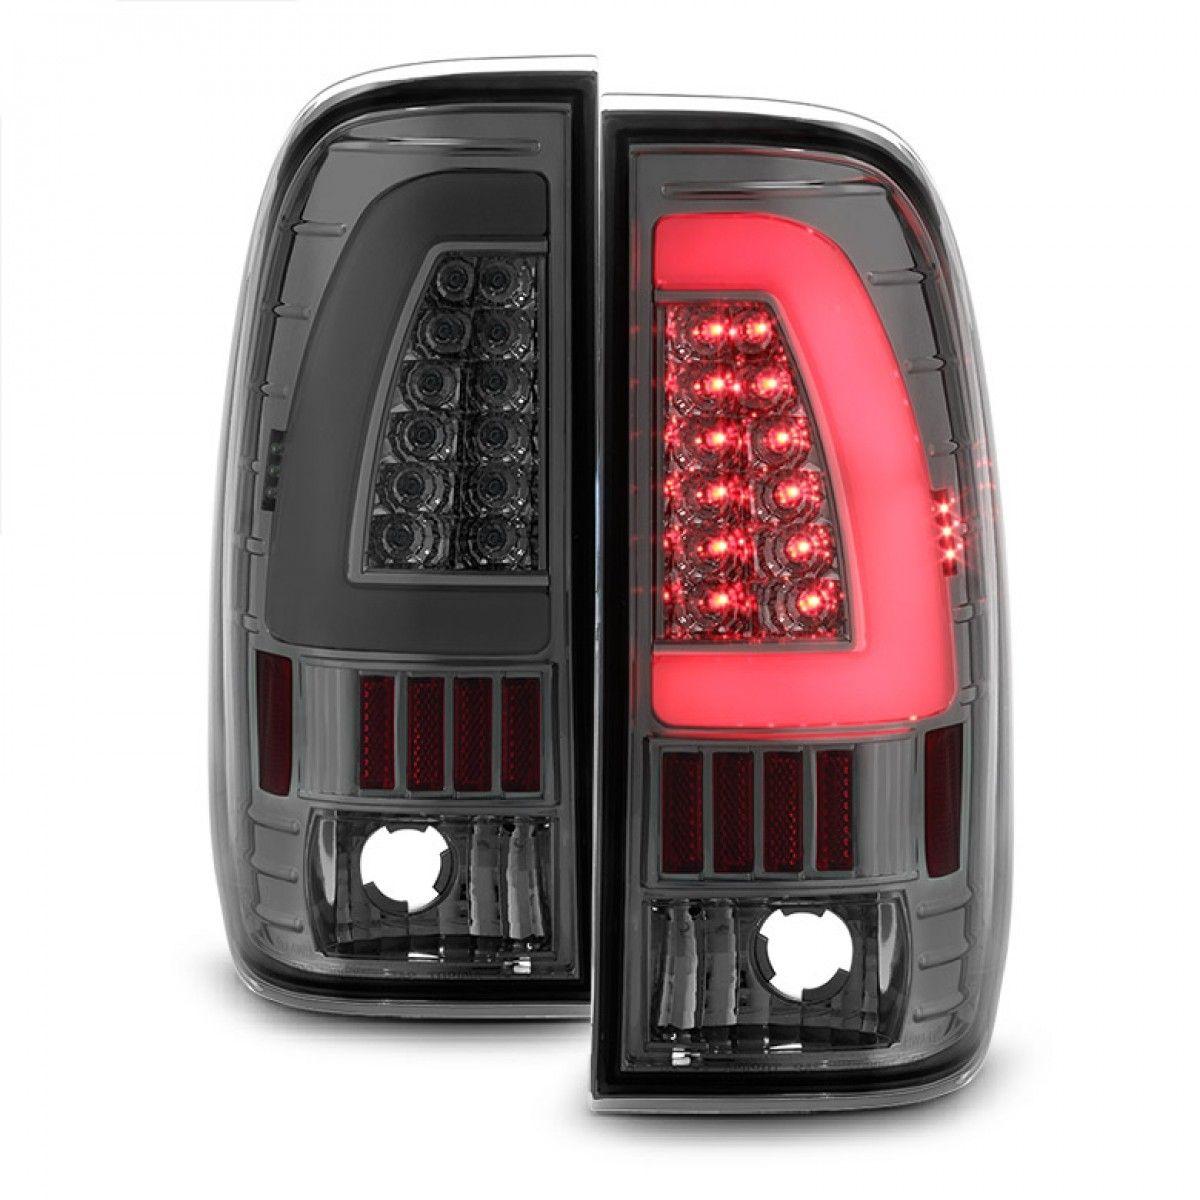 Onebigoutlet 1997 2007 F2 3 4 550 Led Tail Lights W Led Signal Function Smoked Led Tail Lights Tail Light Chevy Accessories